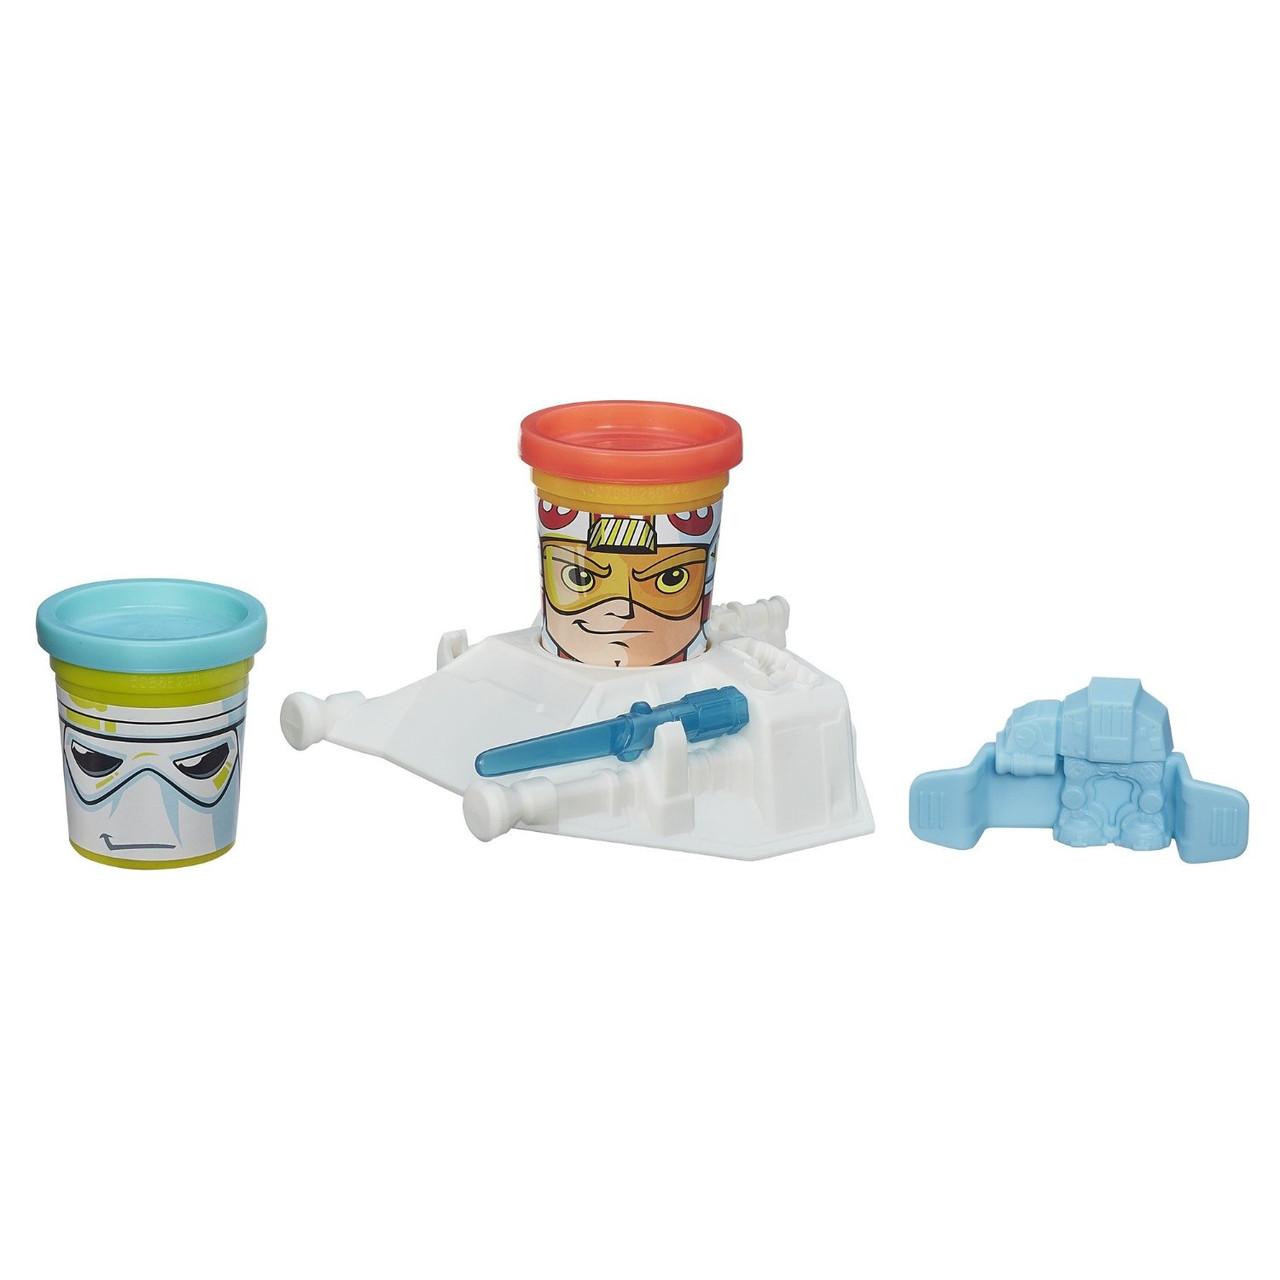 Игровой набор Hasbro Play-Doh Герои Star Wars Luke Skywalker & Snowtrooper